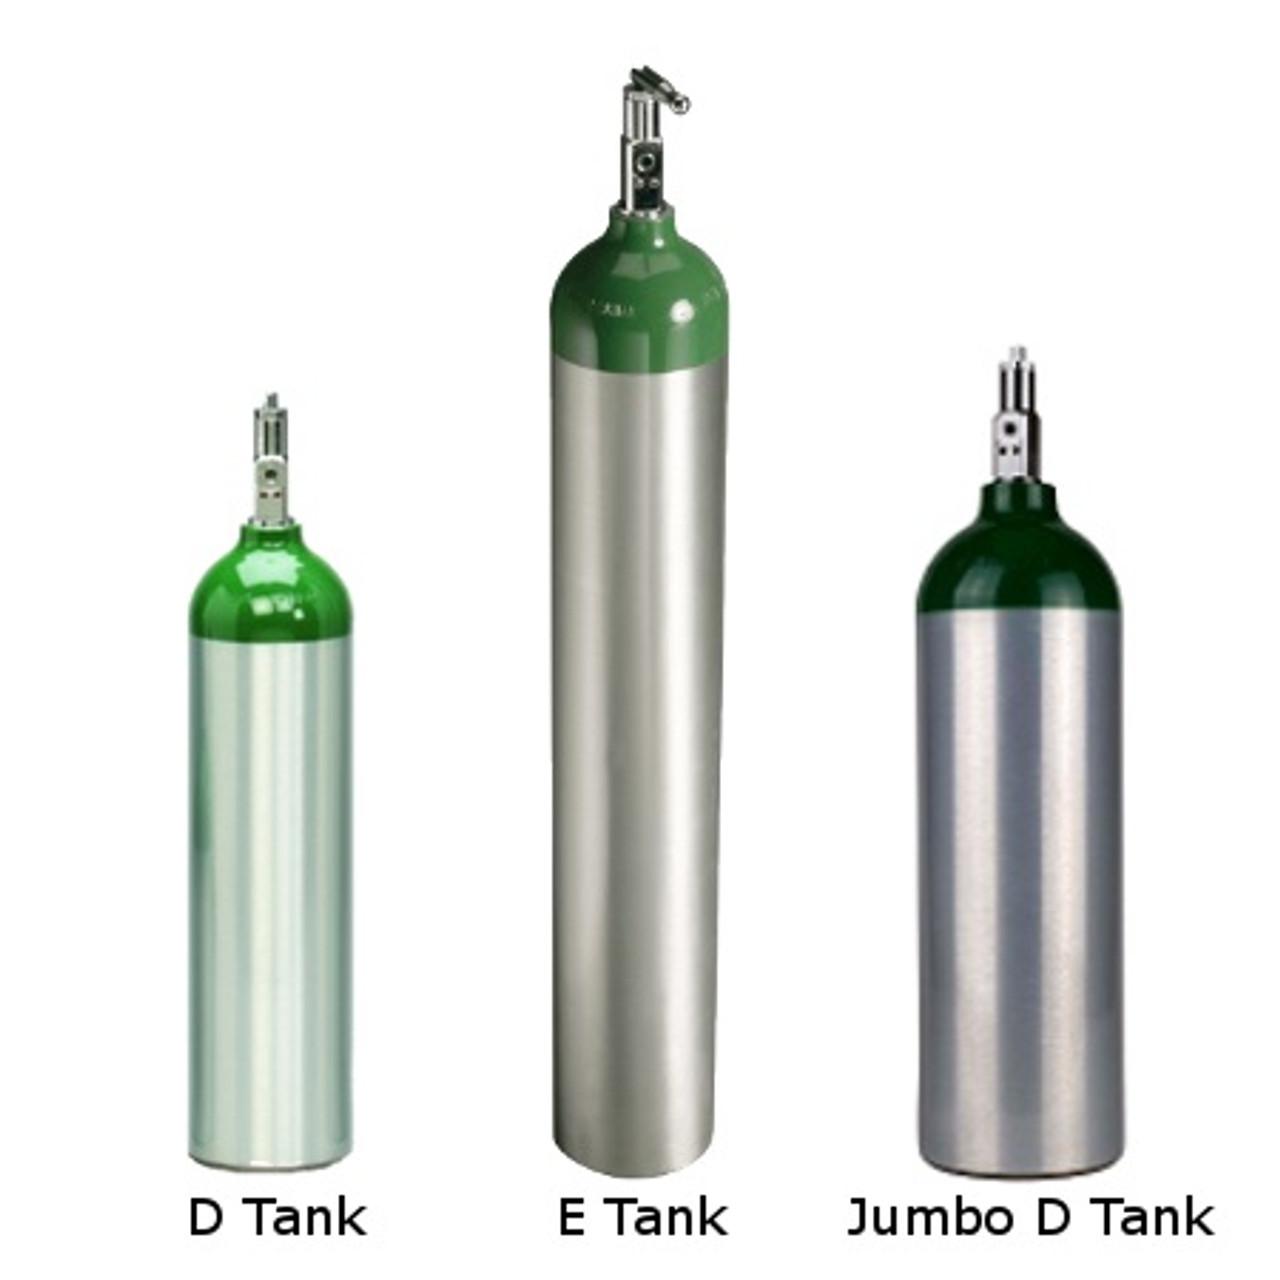 Portable Aluminum Oxygen Tanks - Sizes D, Jumbo D and E - Medical Warehouse